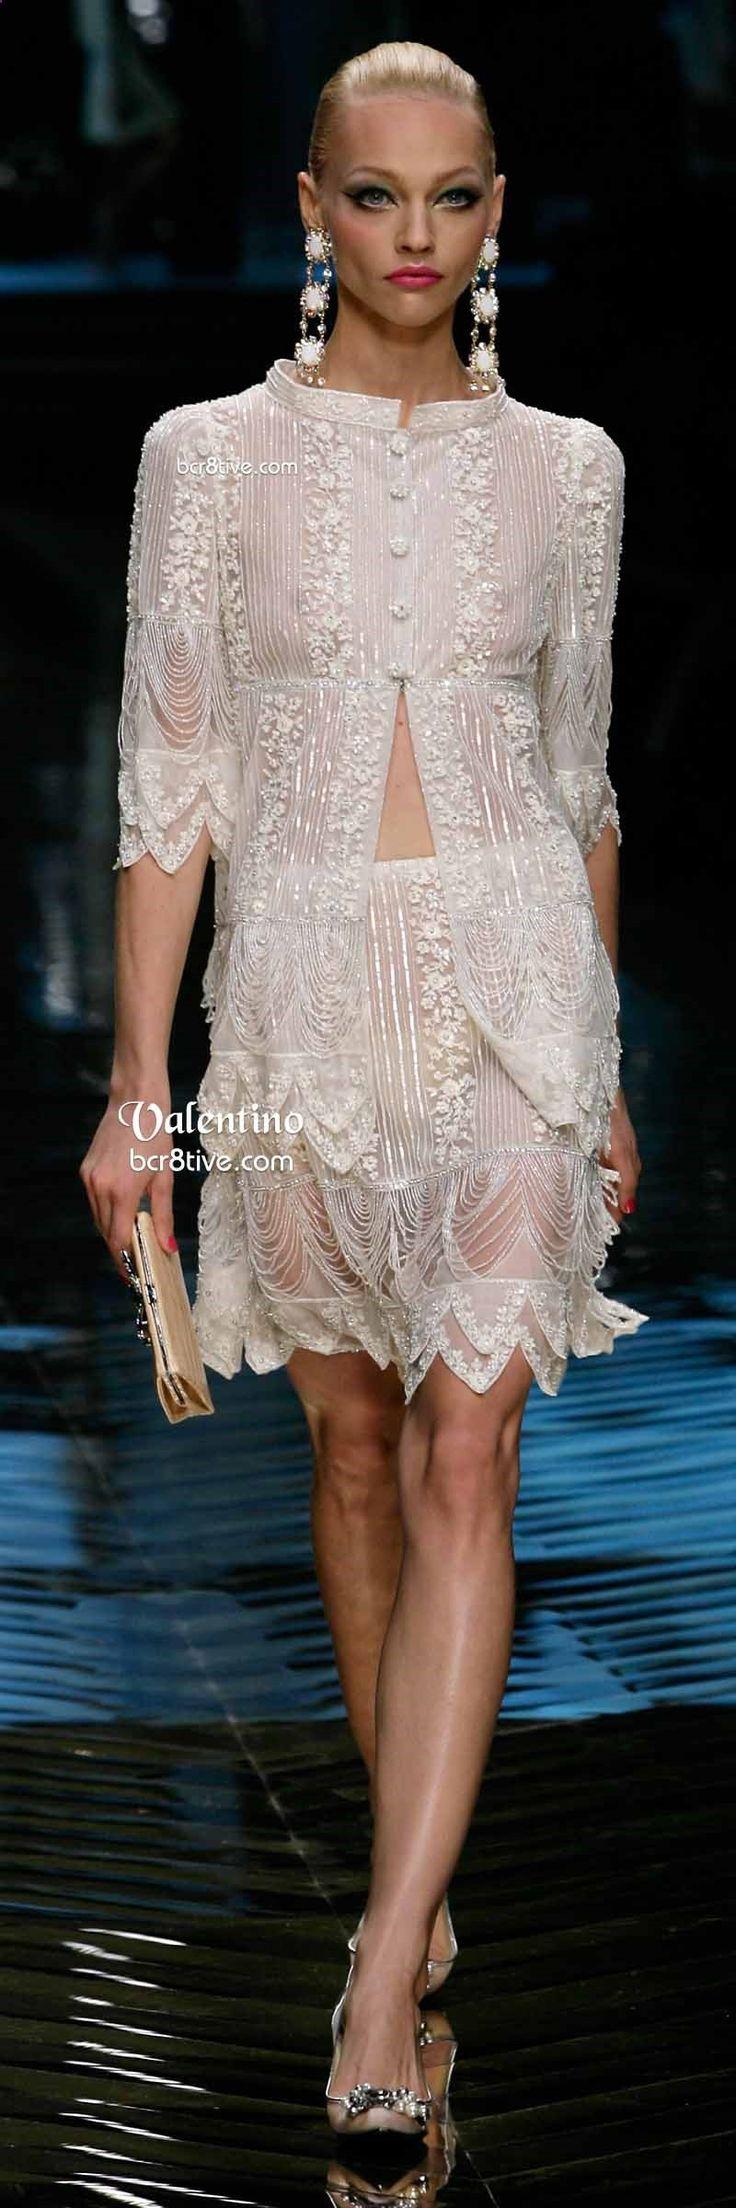 Lace bra under dress september 2019  best Valentino images on Pinterest  Fashion show Vest coat